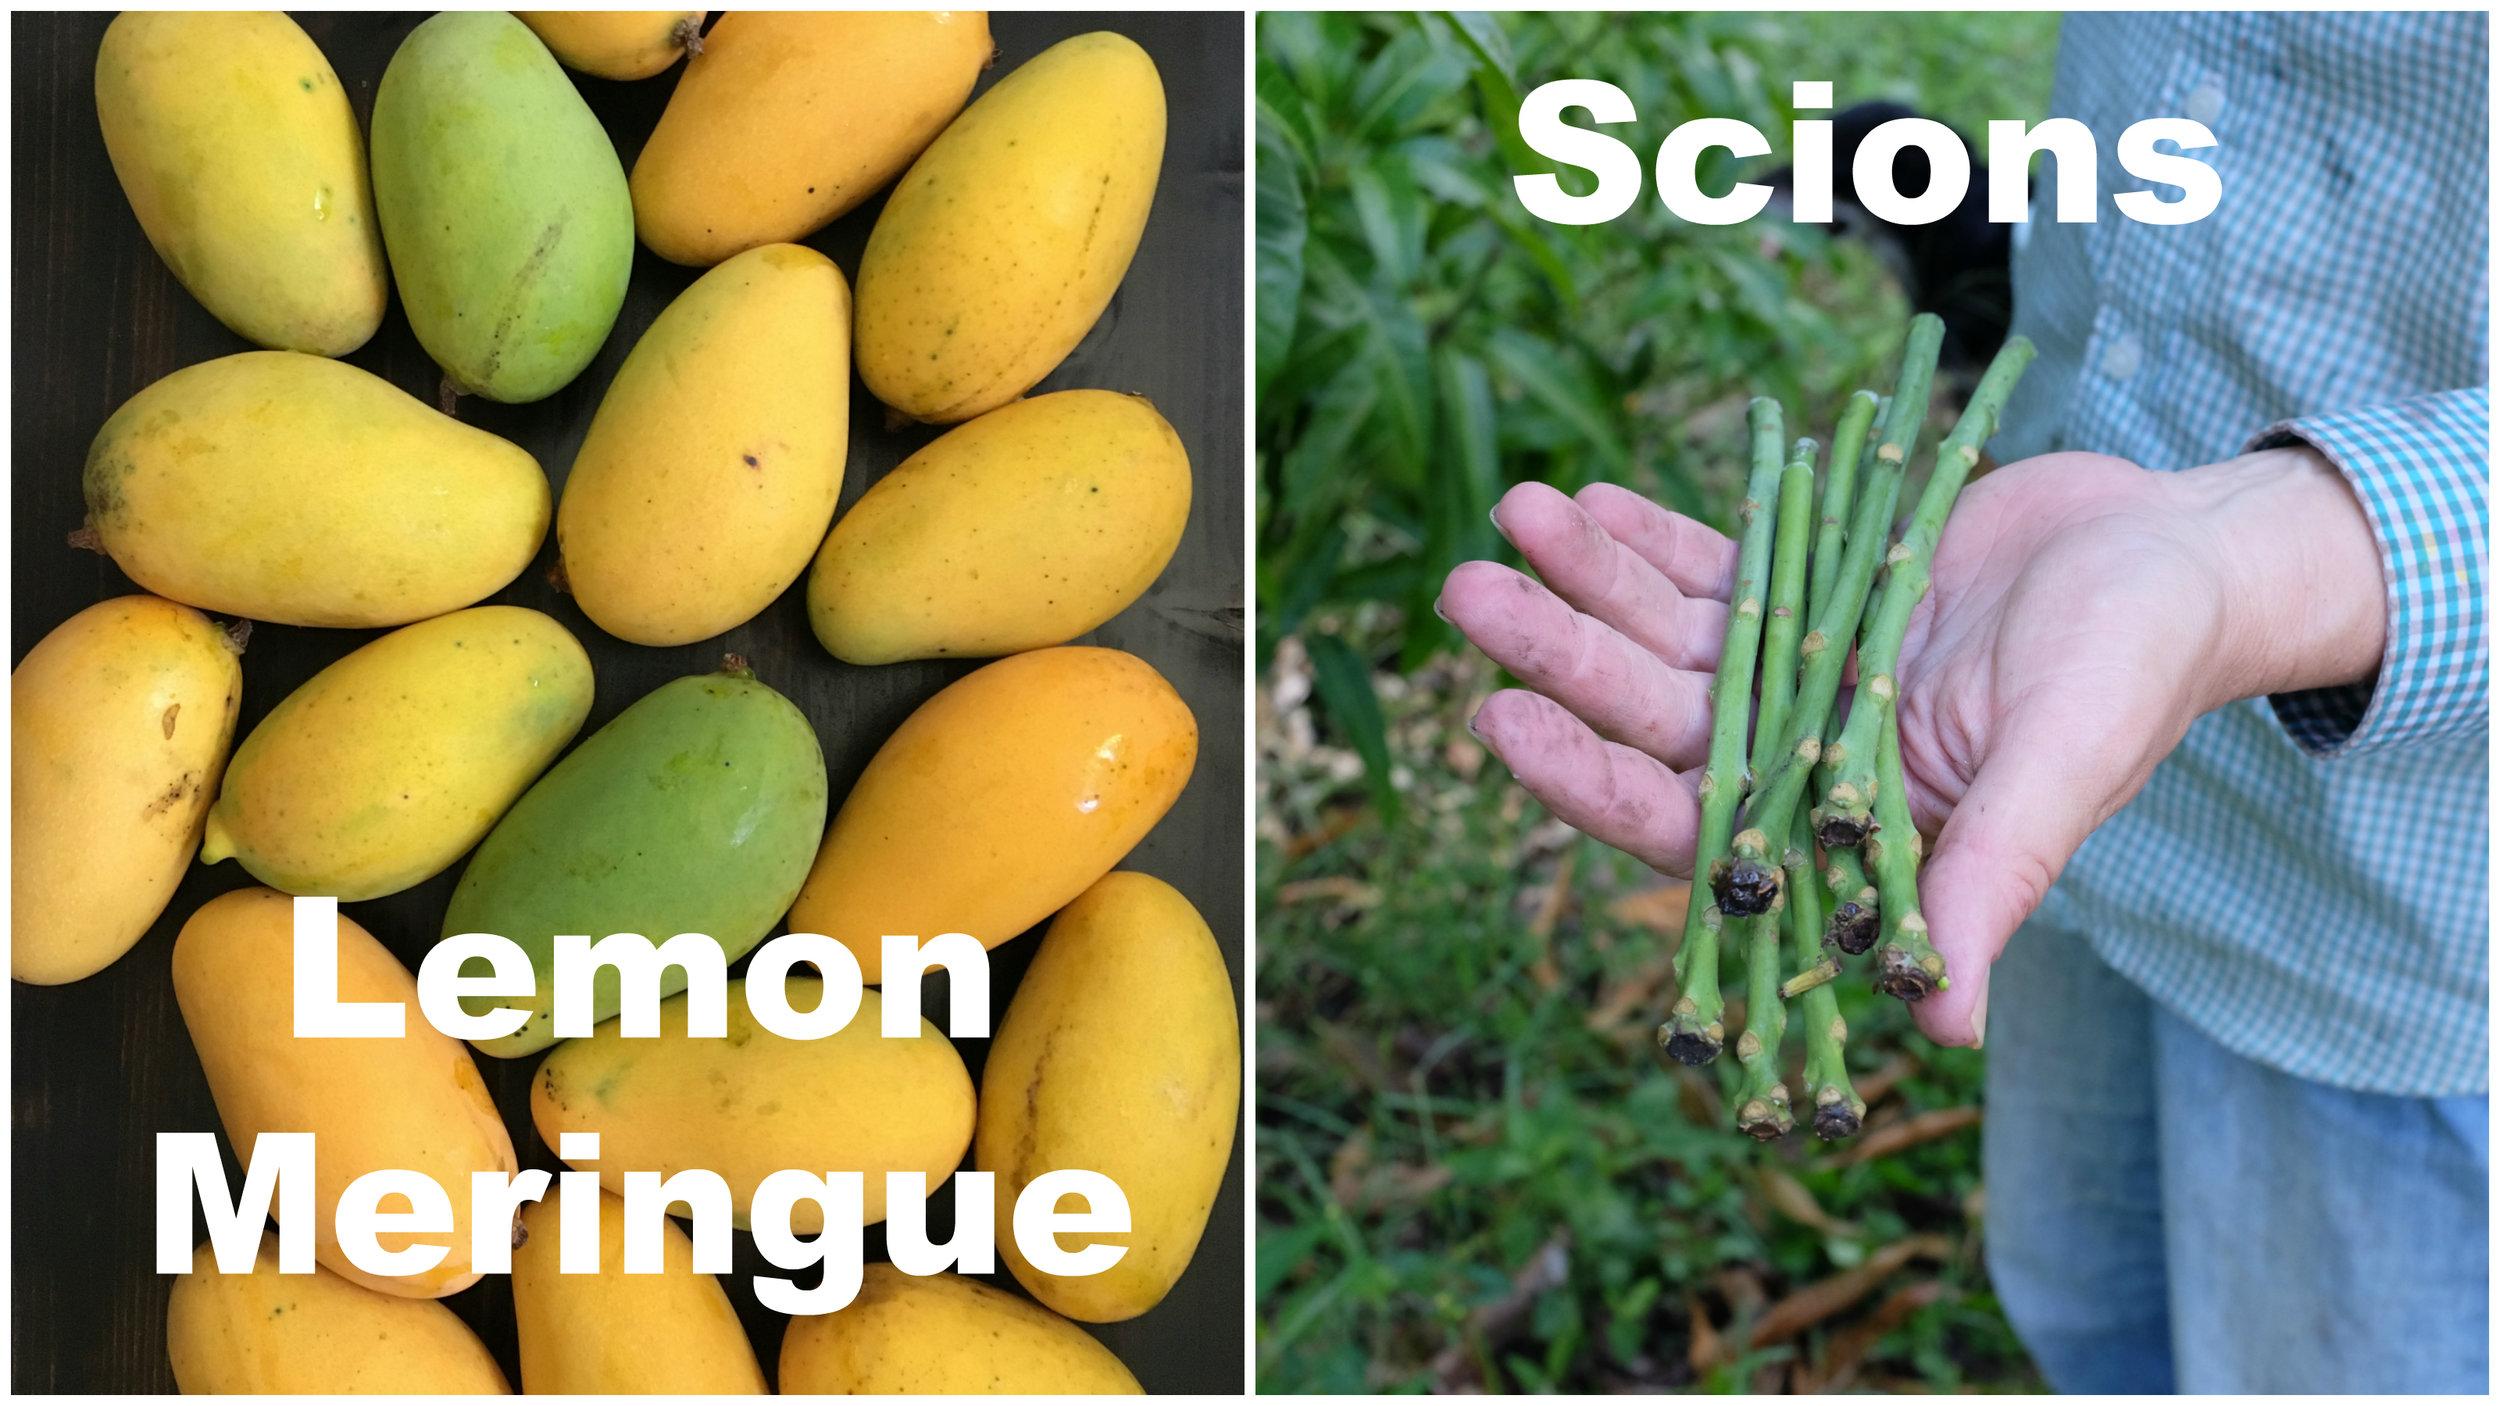 Lemon Meringue scions.jpg